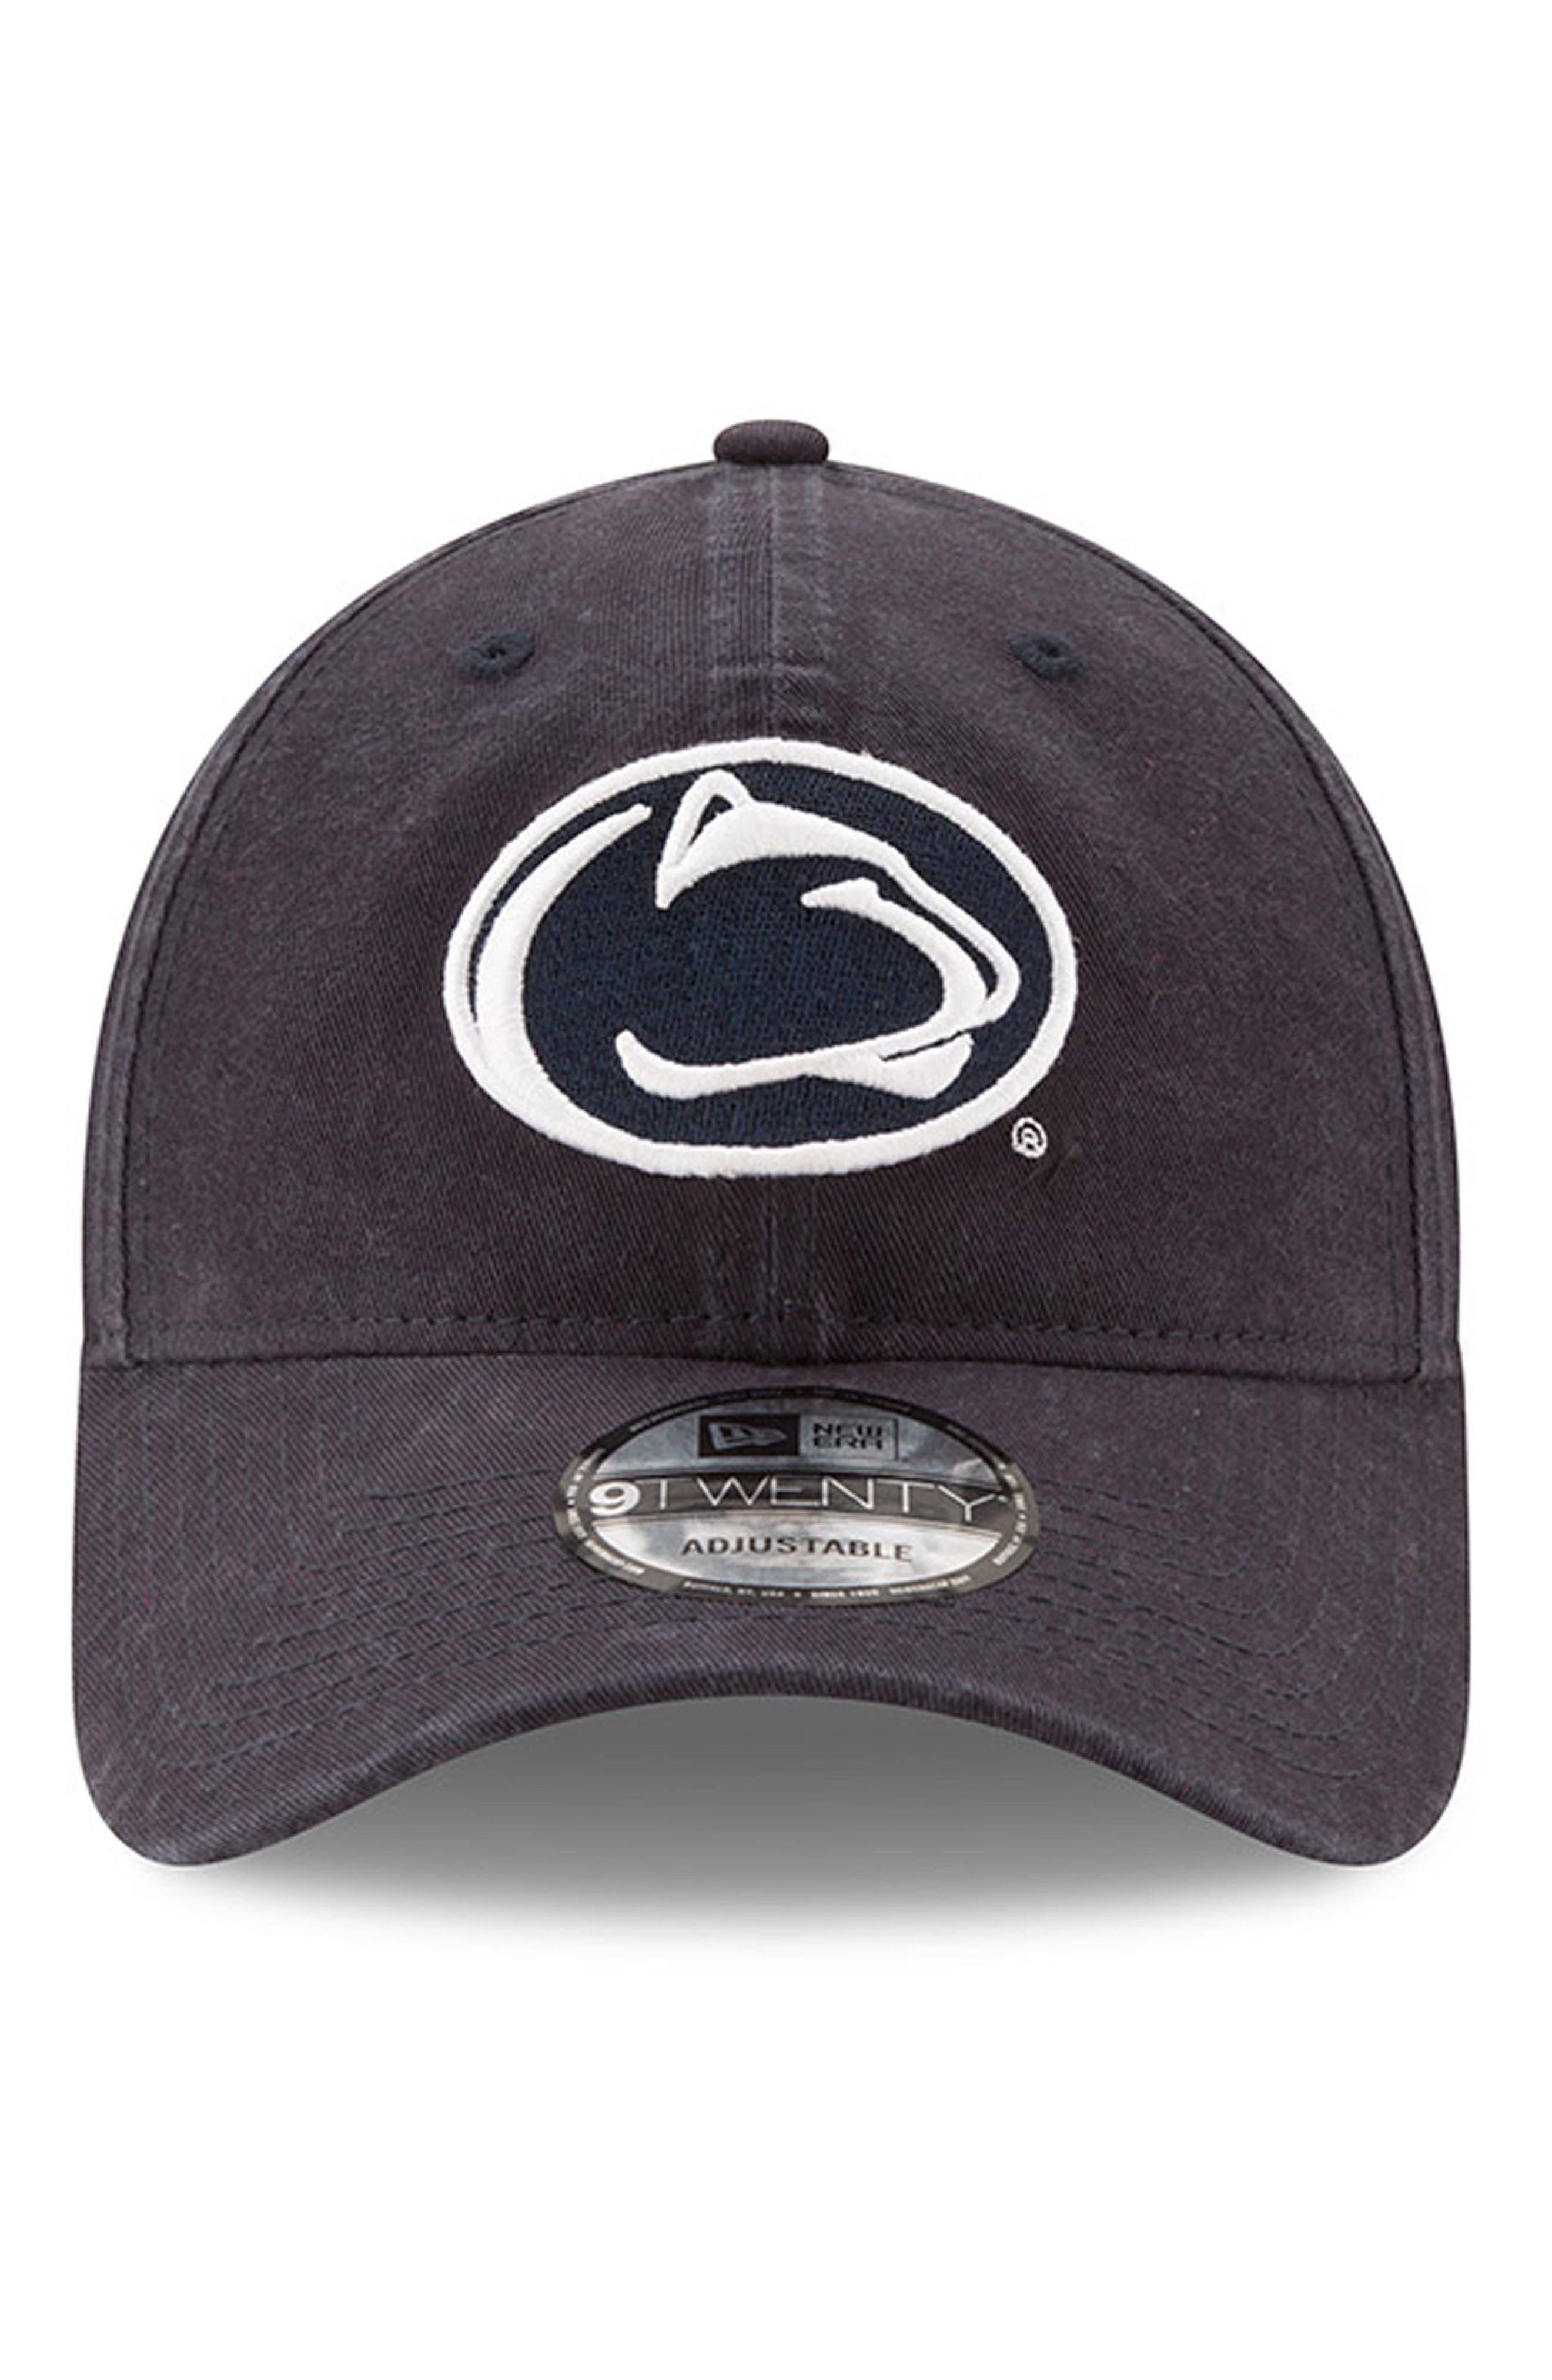 New Era Collegiate Core Classic - Penn State Nittany Lions Baseball Cap,                             Alternate thumbnail 5, color,                             Penn State Nittany Lions